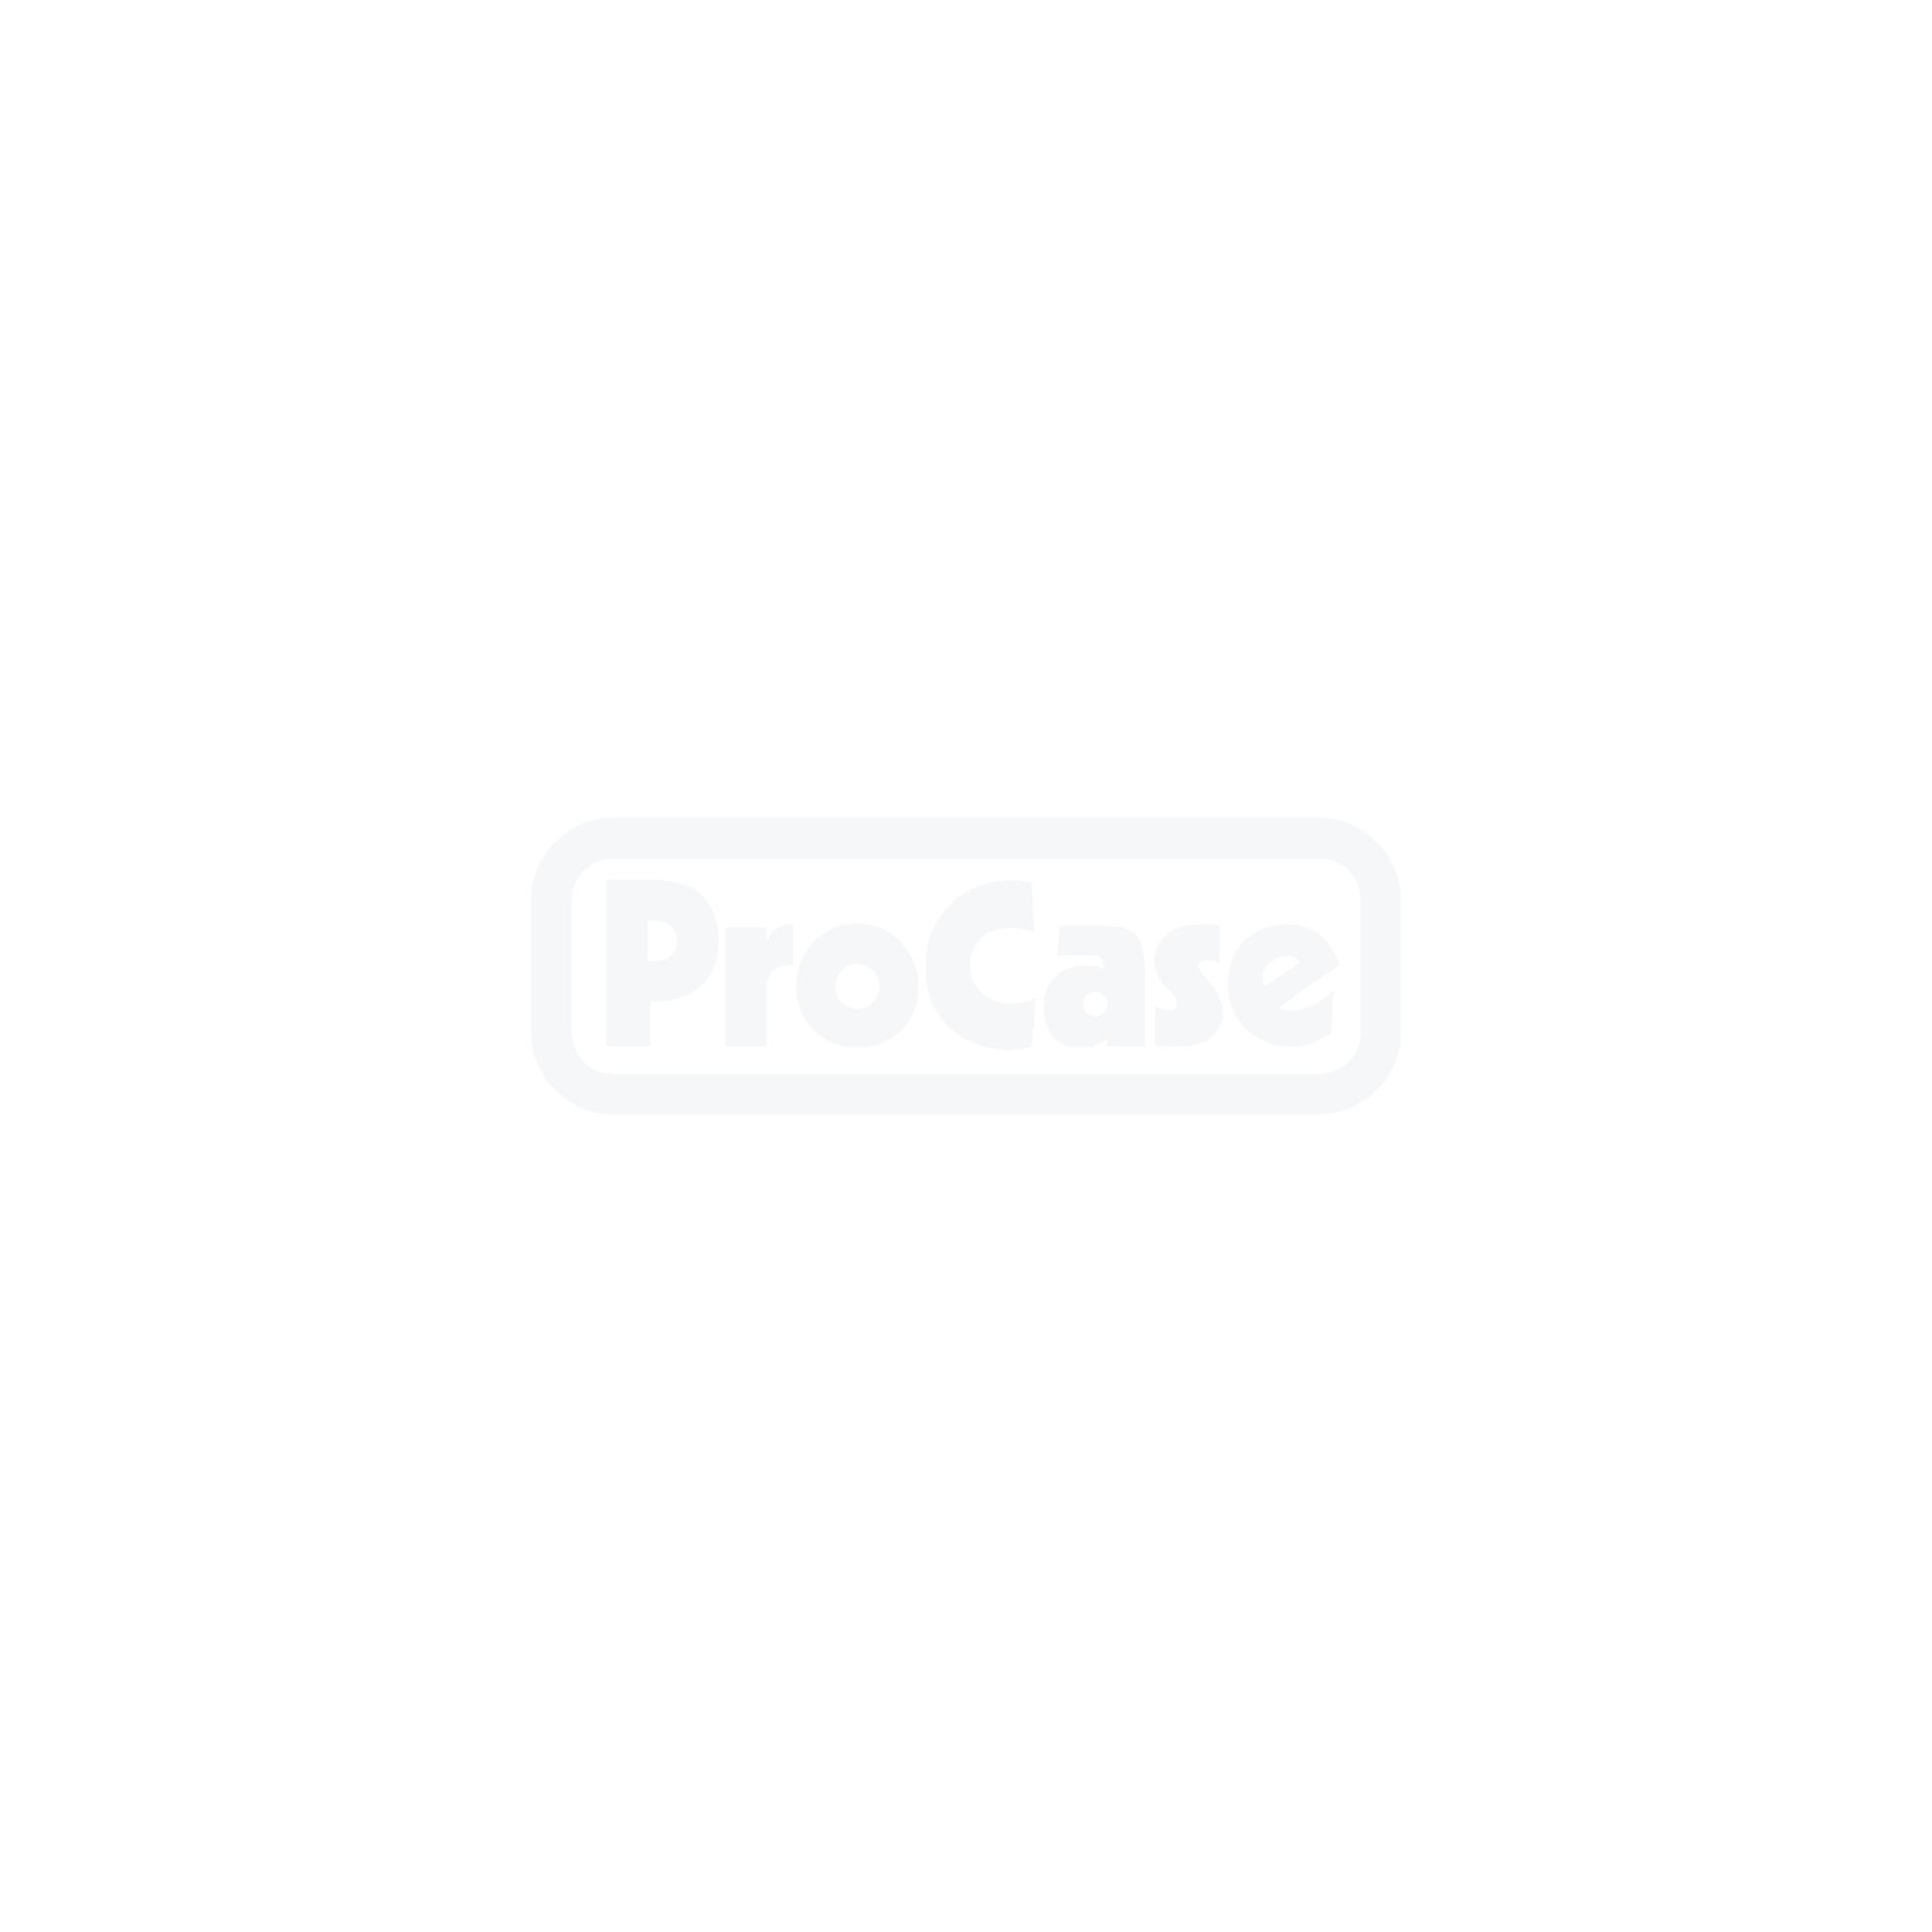 Flightcase für 4x Major 2-Cell Blinder